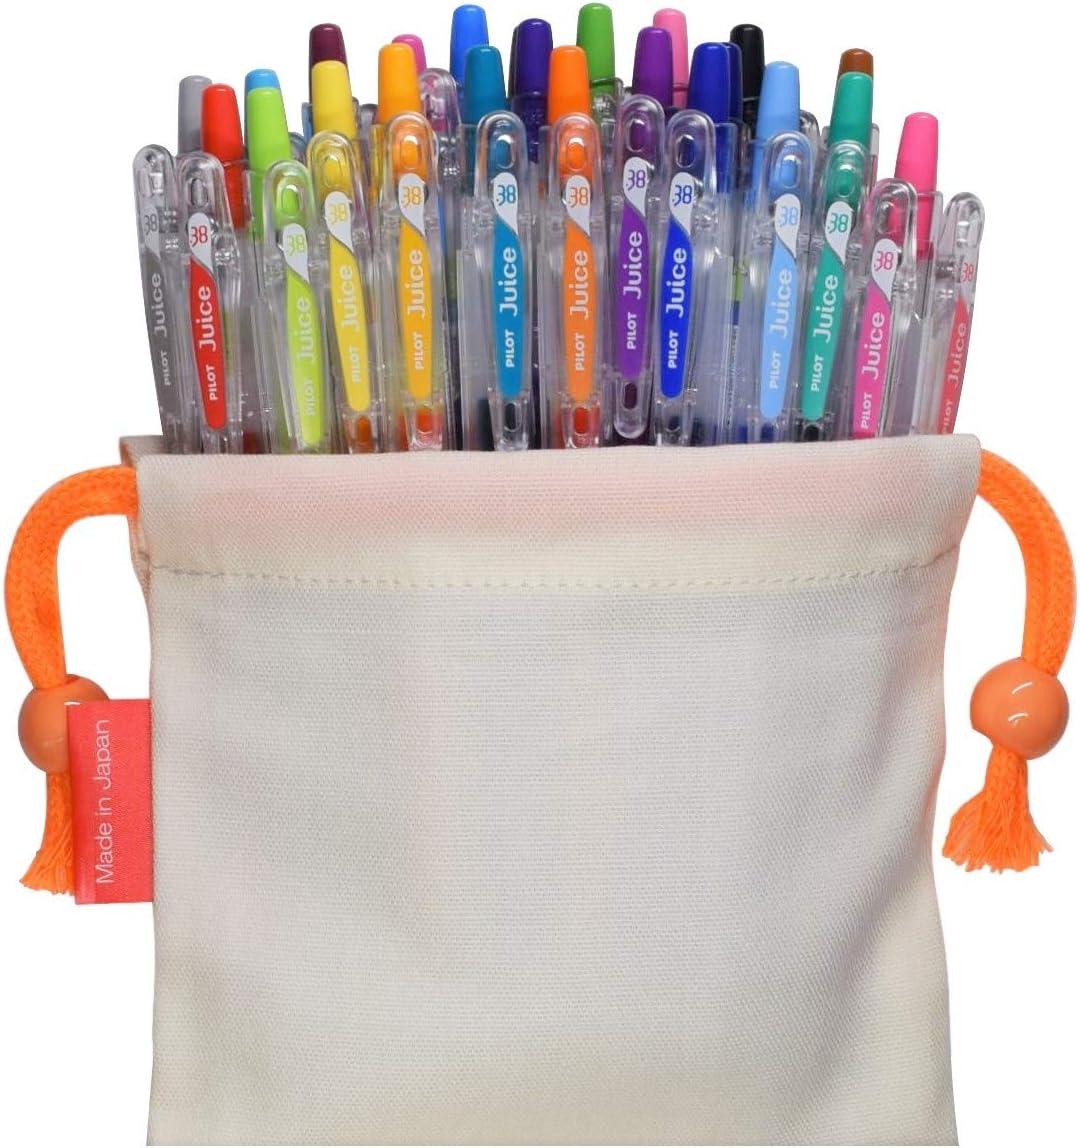 Pilot Juice Gel Ink Retractable Ballpoint Pen (0.38mm Ultra fine Point, 24 Color with Drawstring Bag Set)